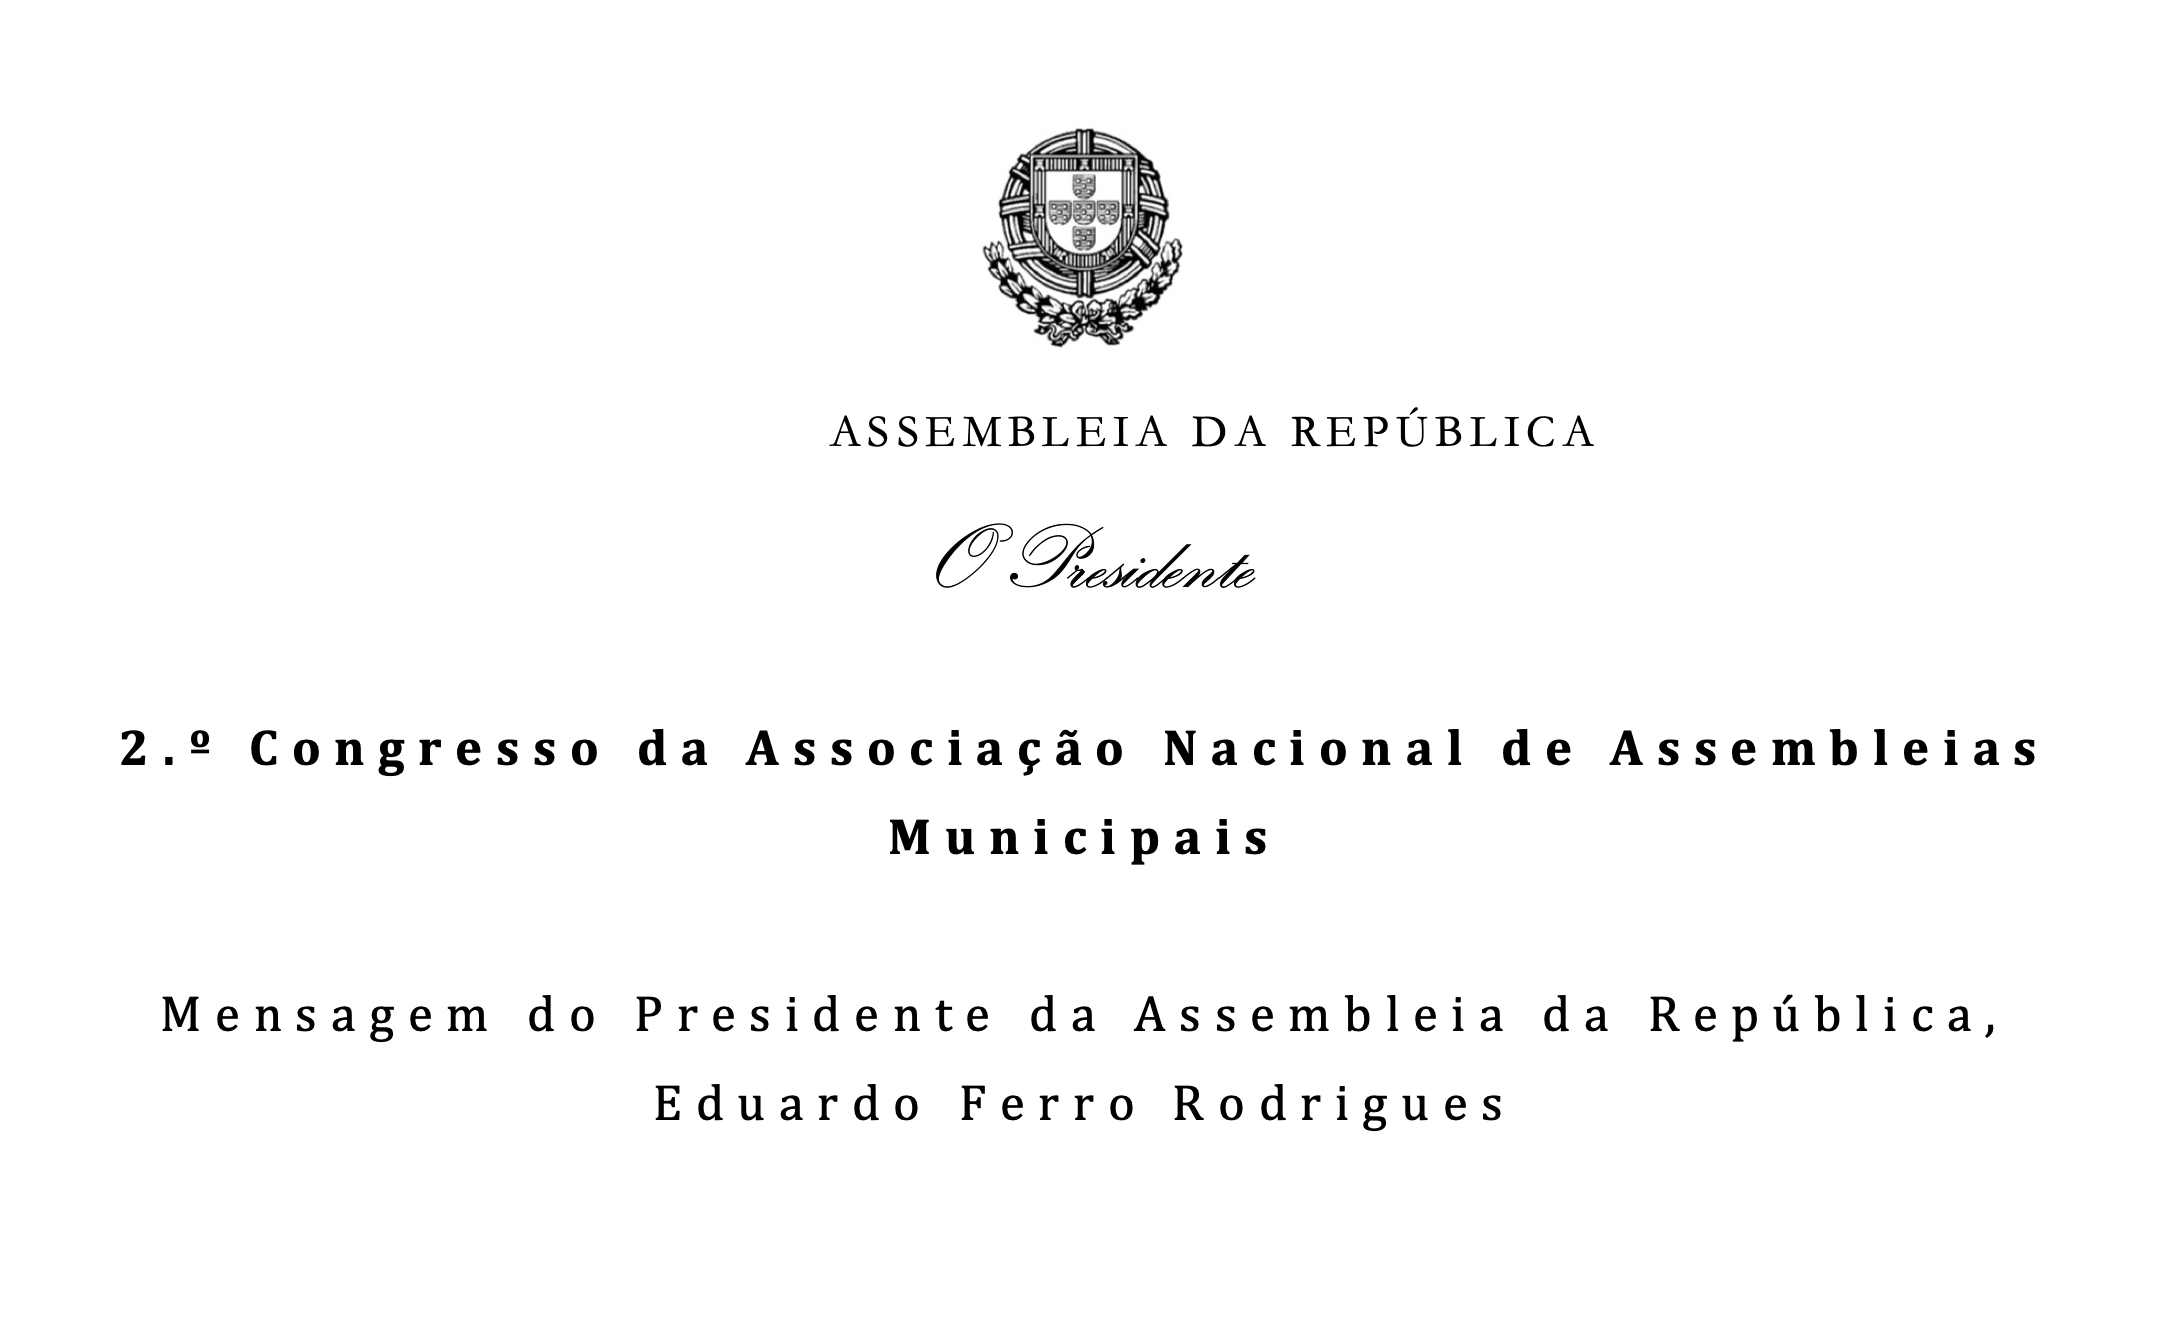 Presidente da Assembleia da República